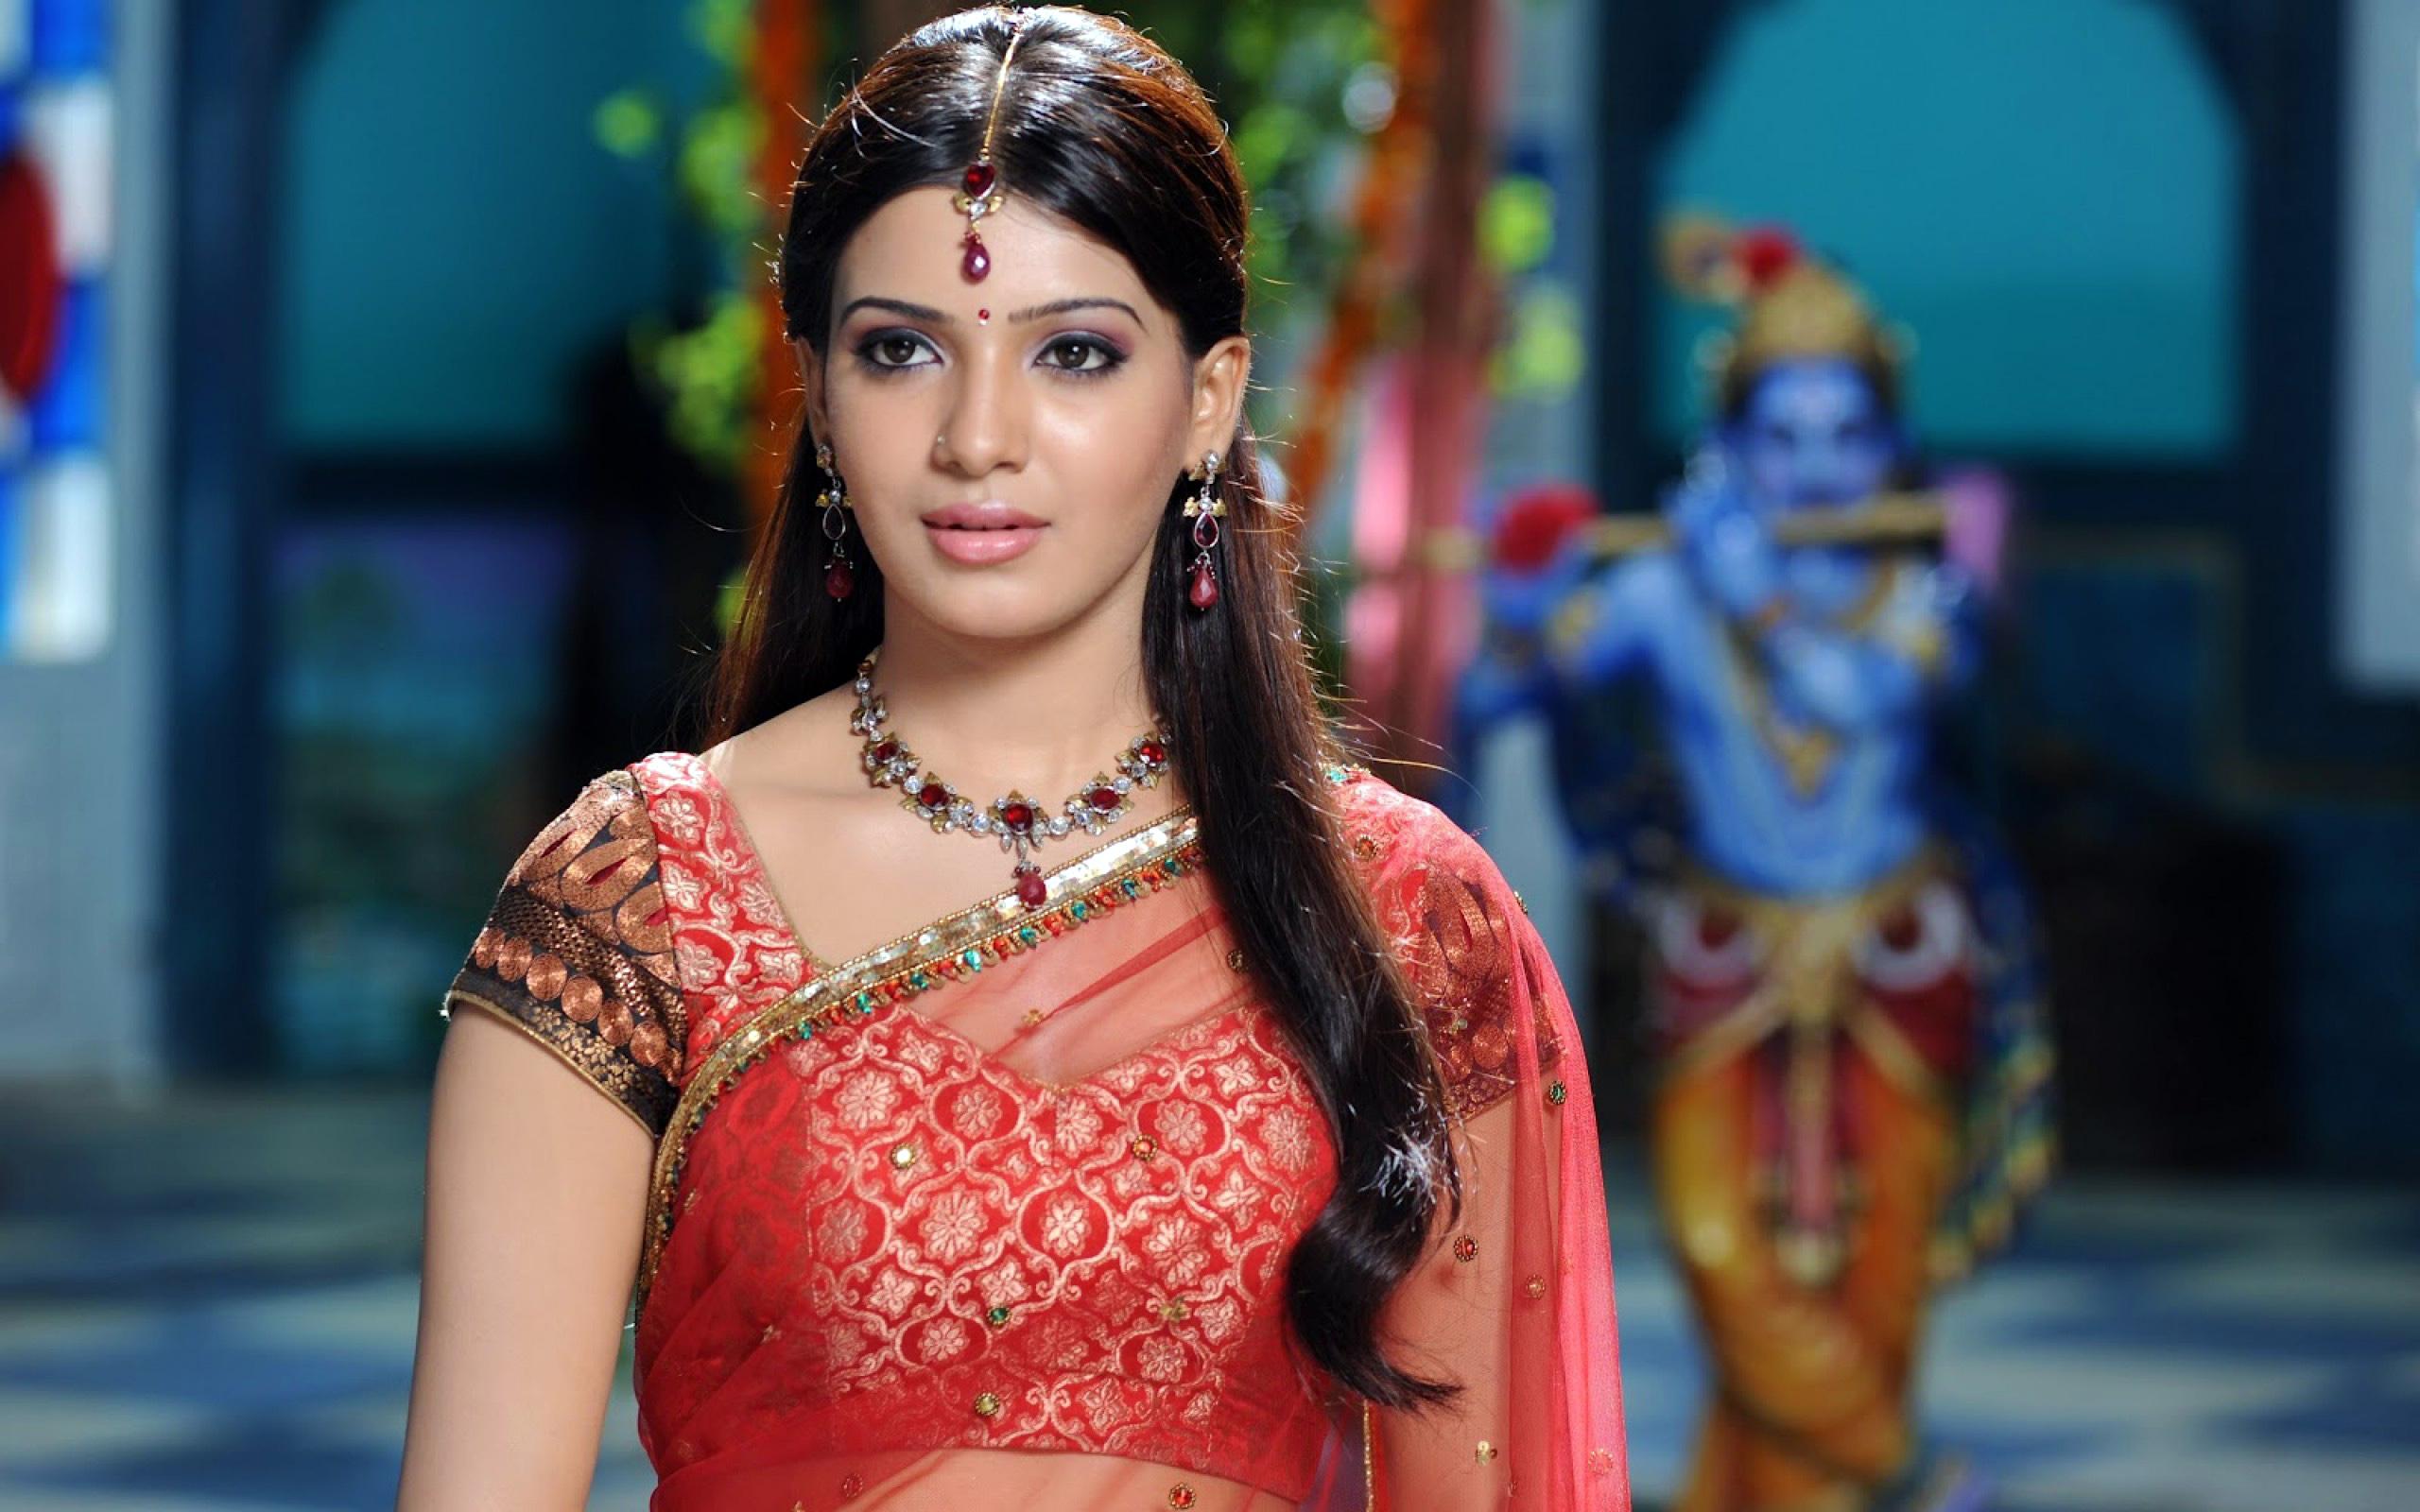 Samantha ruth prabhu red saree pictures